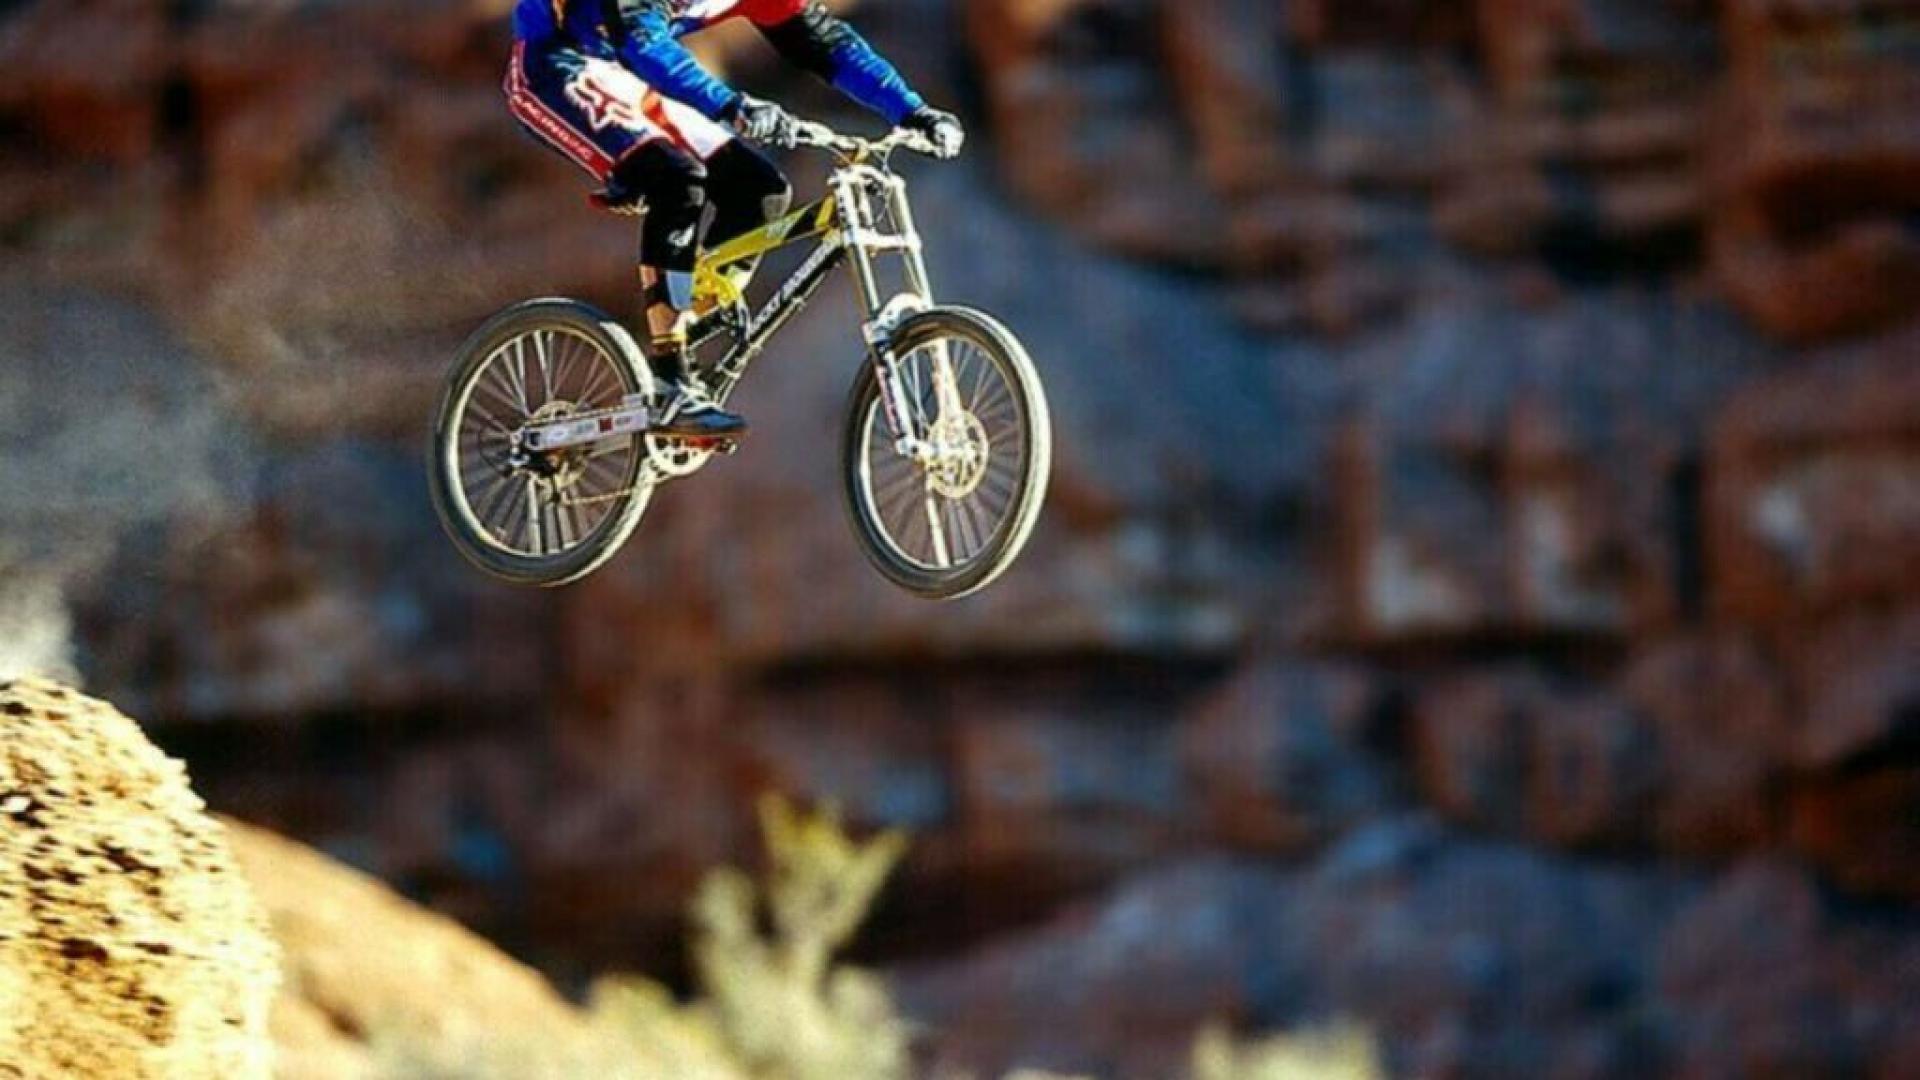 Mountain Biking Bike Hd Wallpaper Wallpapers Trend